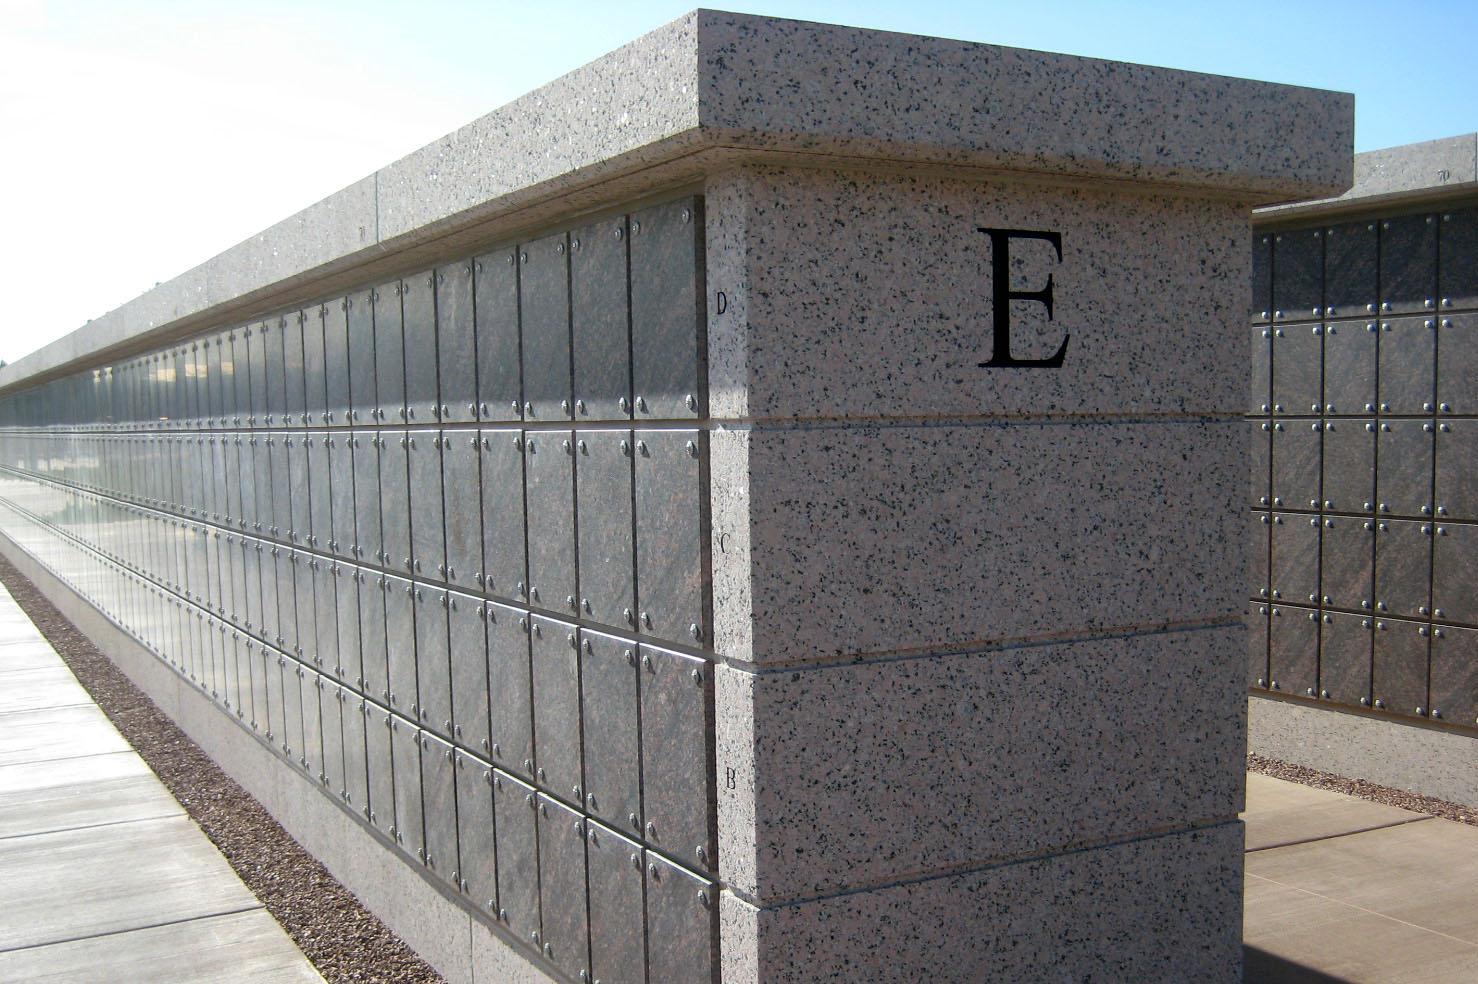 Fort Bliss National Cemetery - Columbarium design